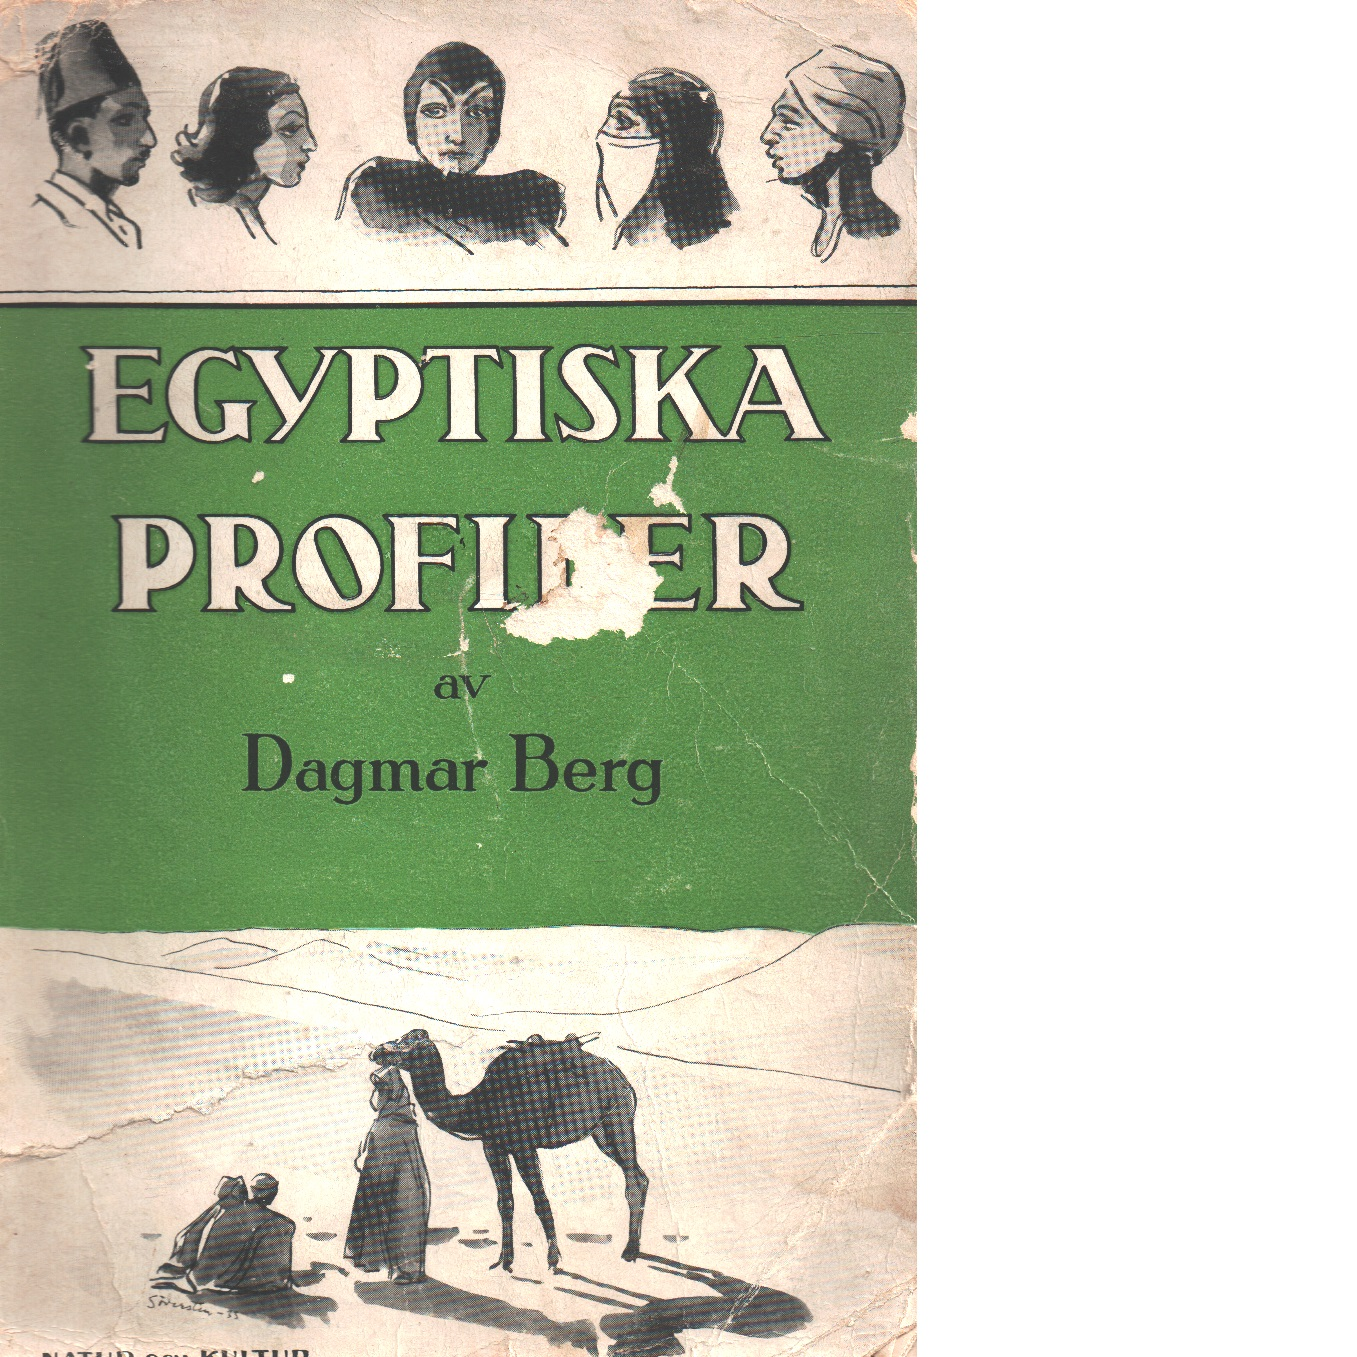 Egyptiska profiler. - Berg, Dagmar